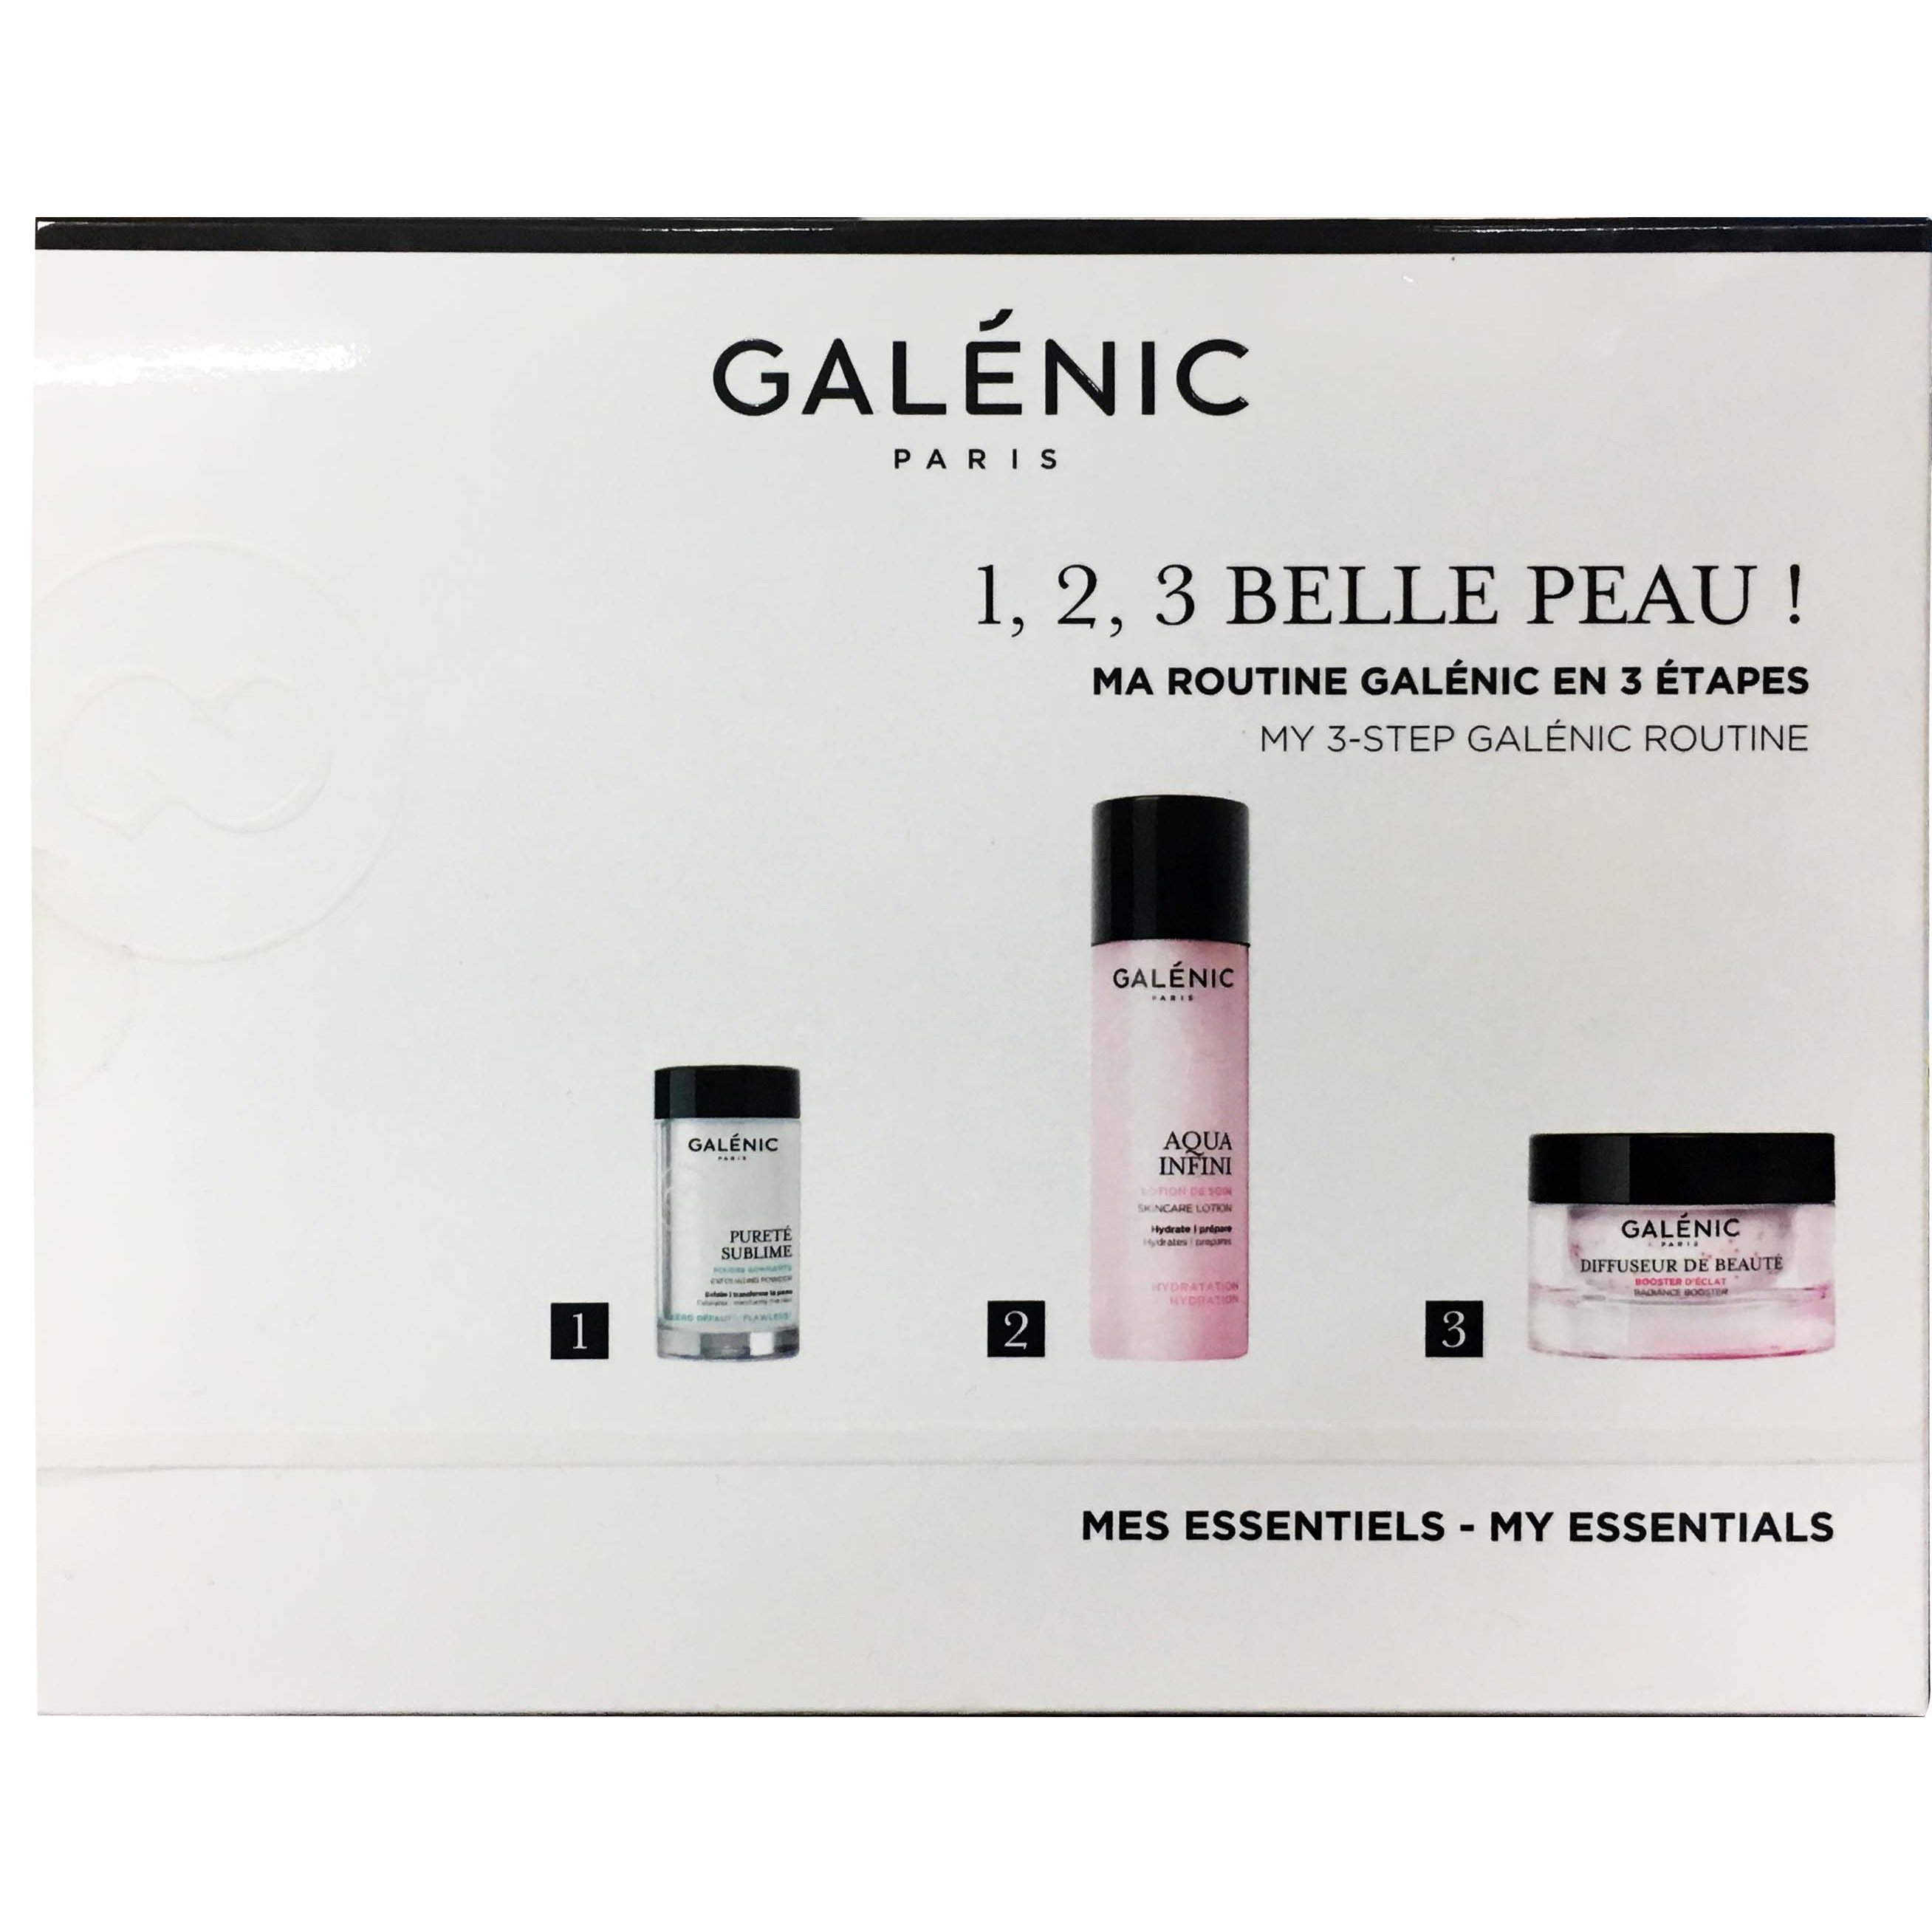 Galenic Promo Poudre Gommante Απολεπιστική Πούδρα 3gr,Aqua Infini Lotion Λοσιόν Προετοιμασίας 40ml & Diffuseur de Beaute 15ml